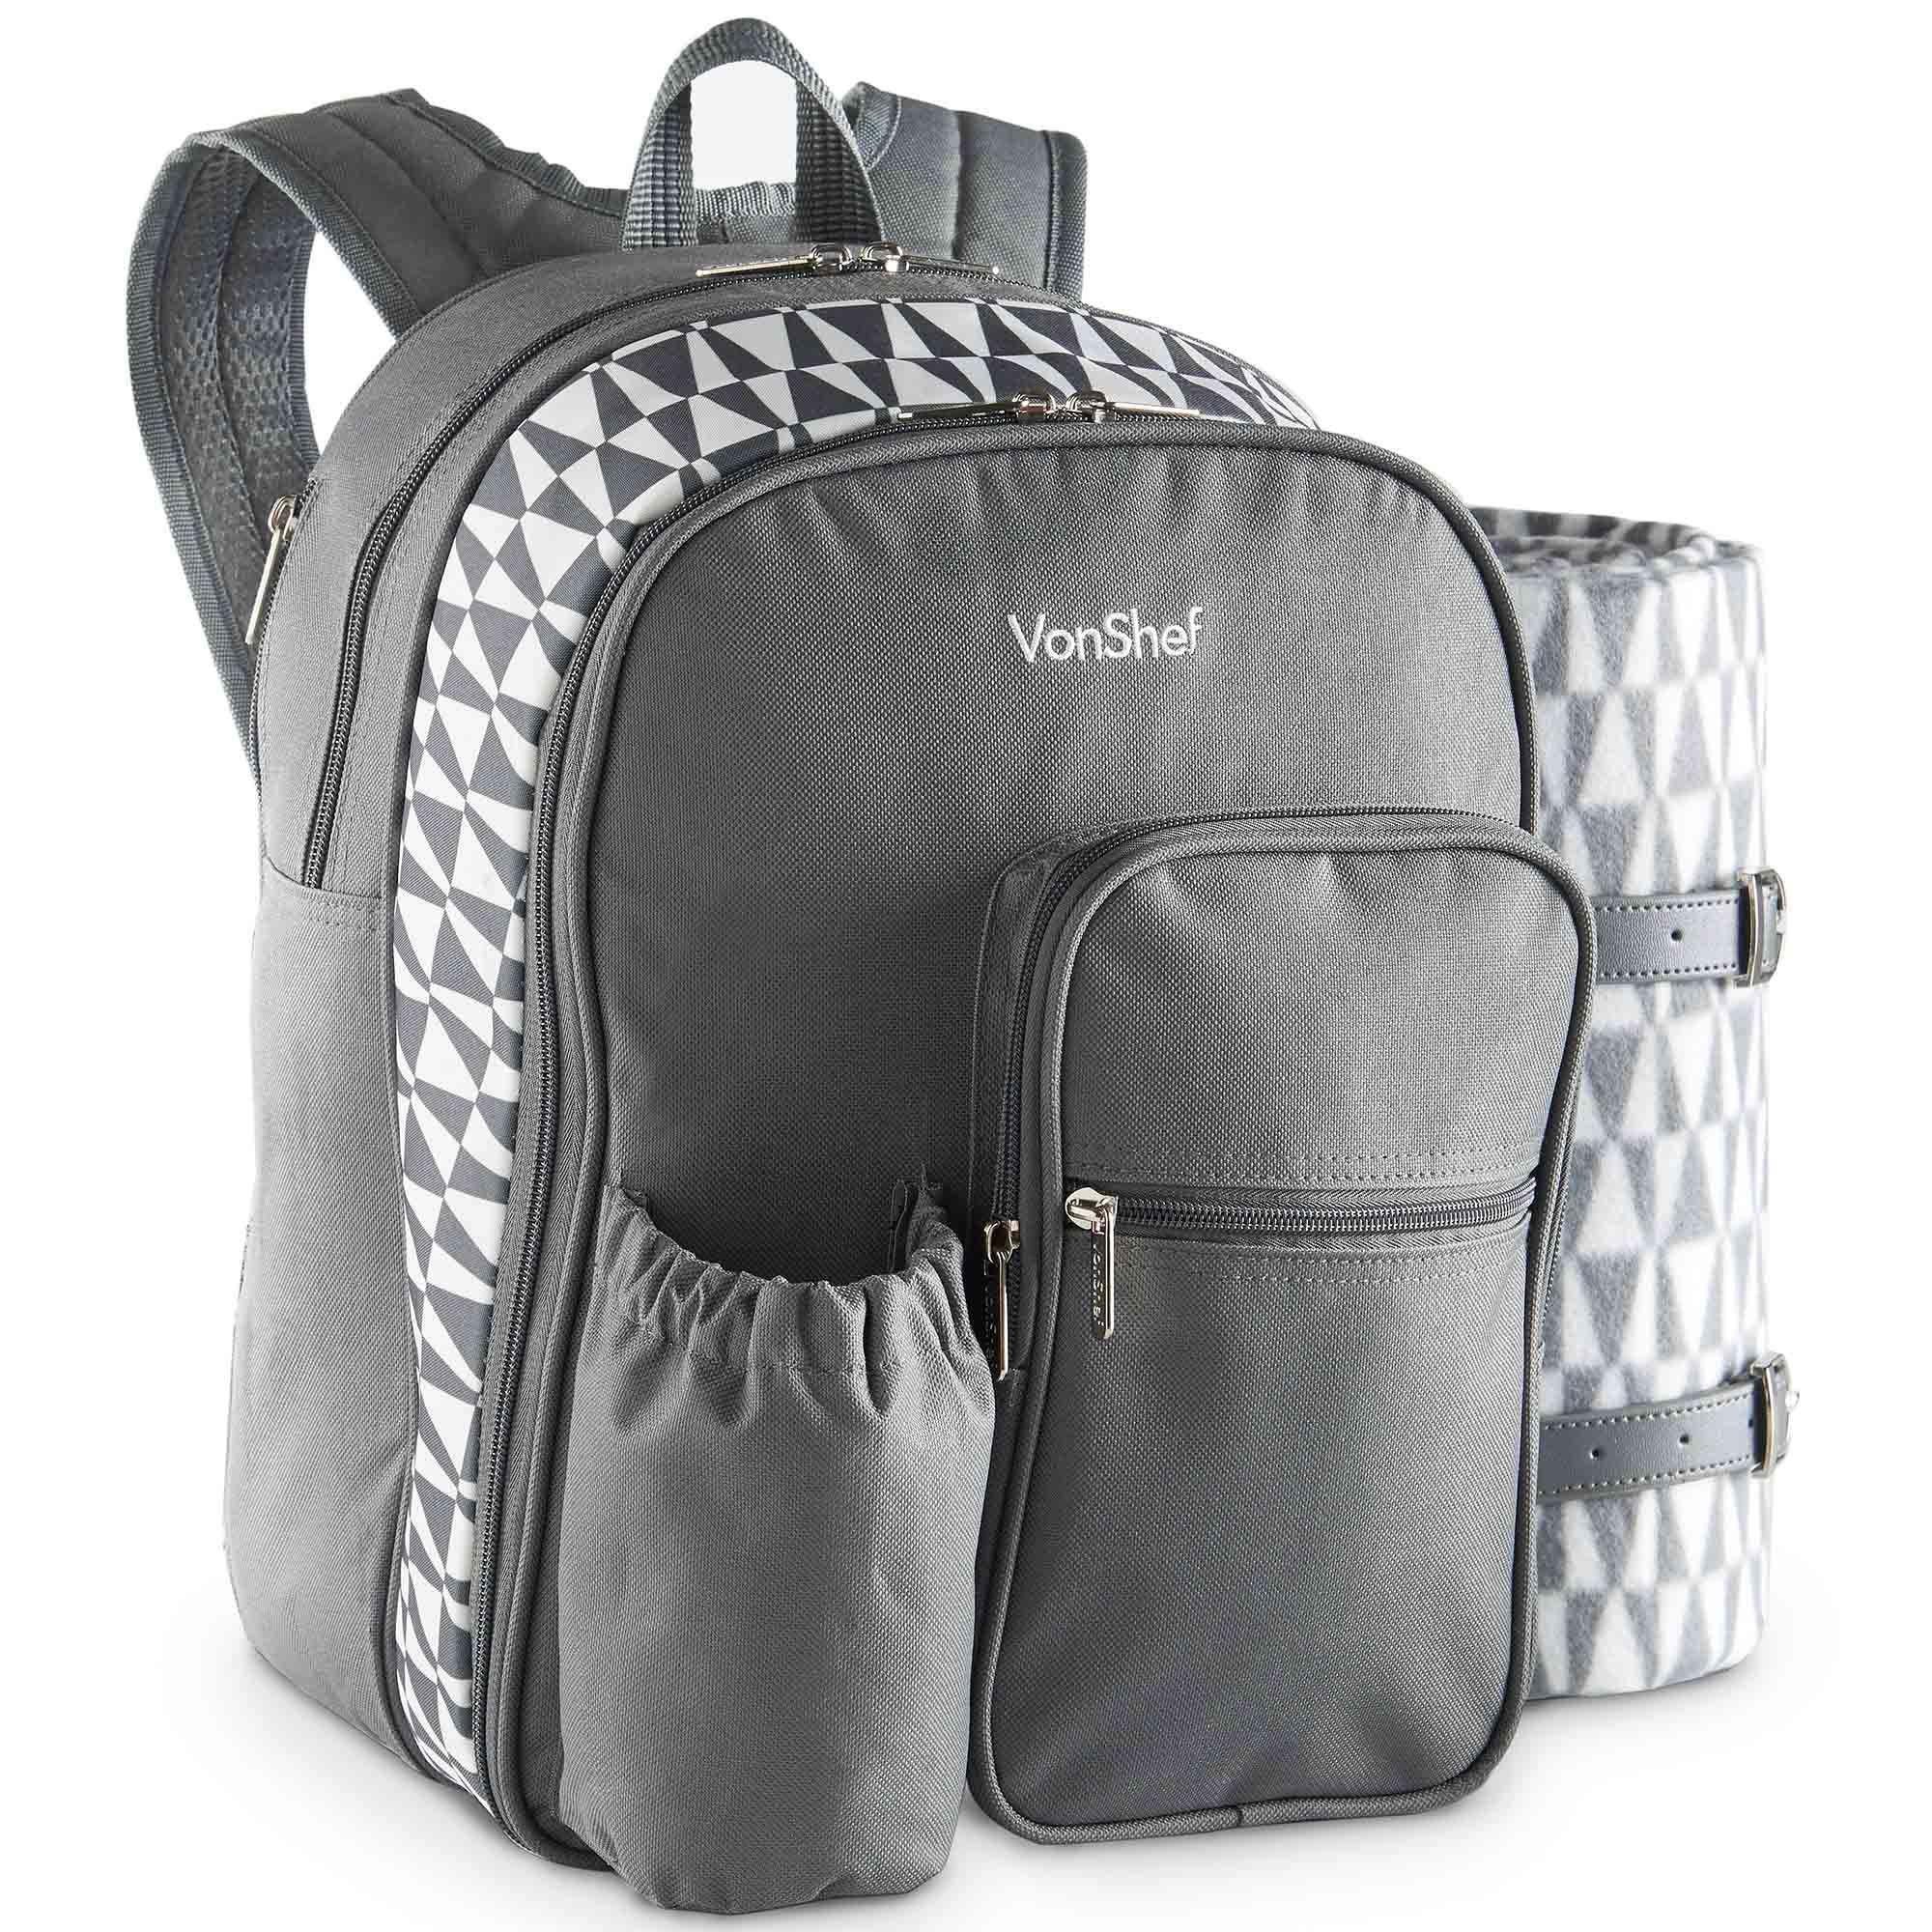 Vonshef 2 Person Picnic Backpack Bag Grey With Blanket